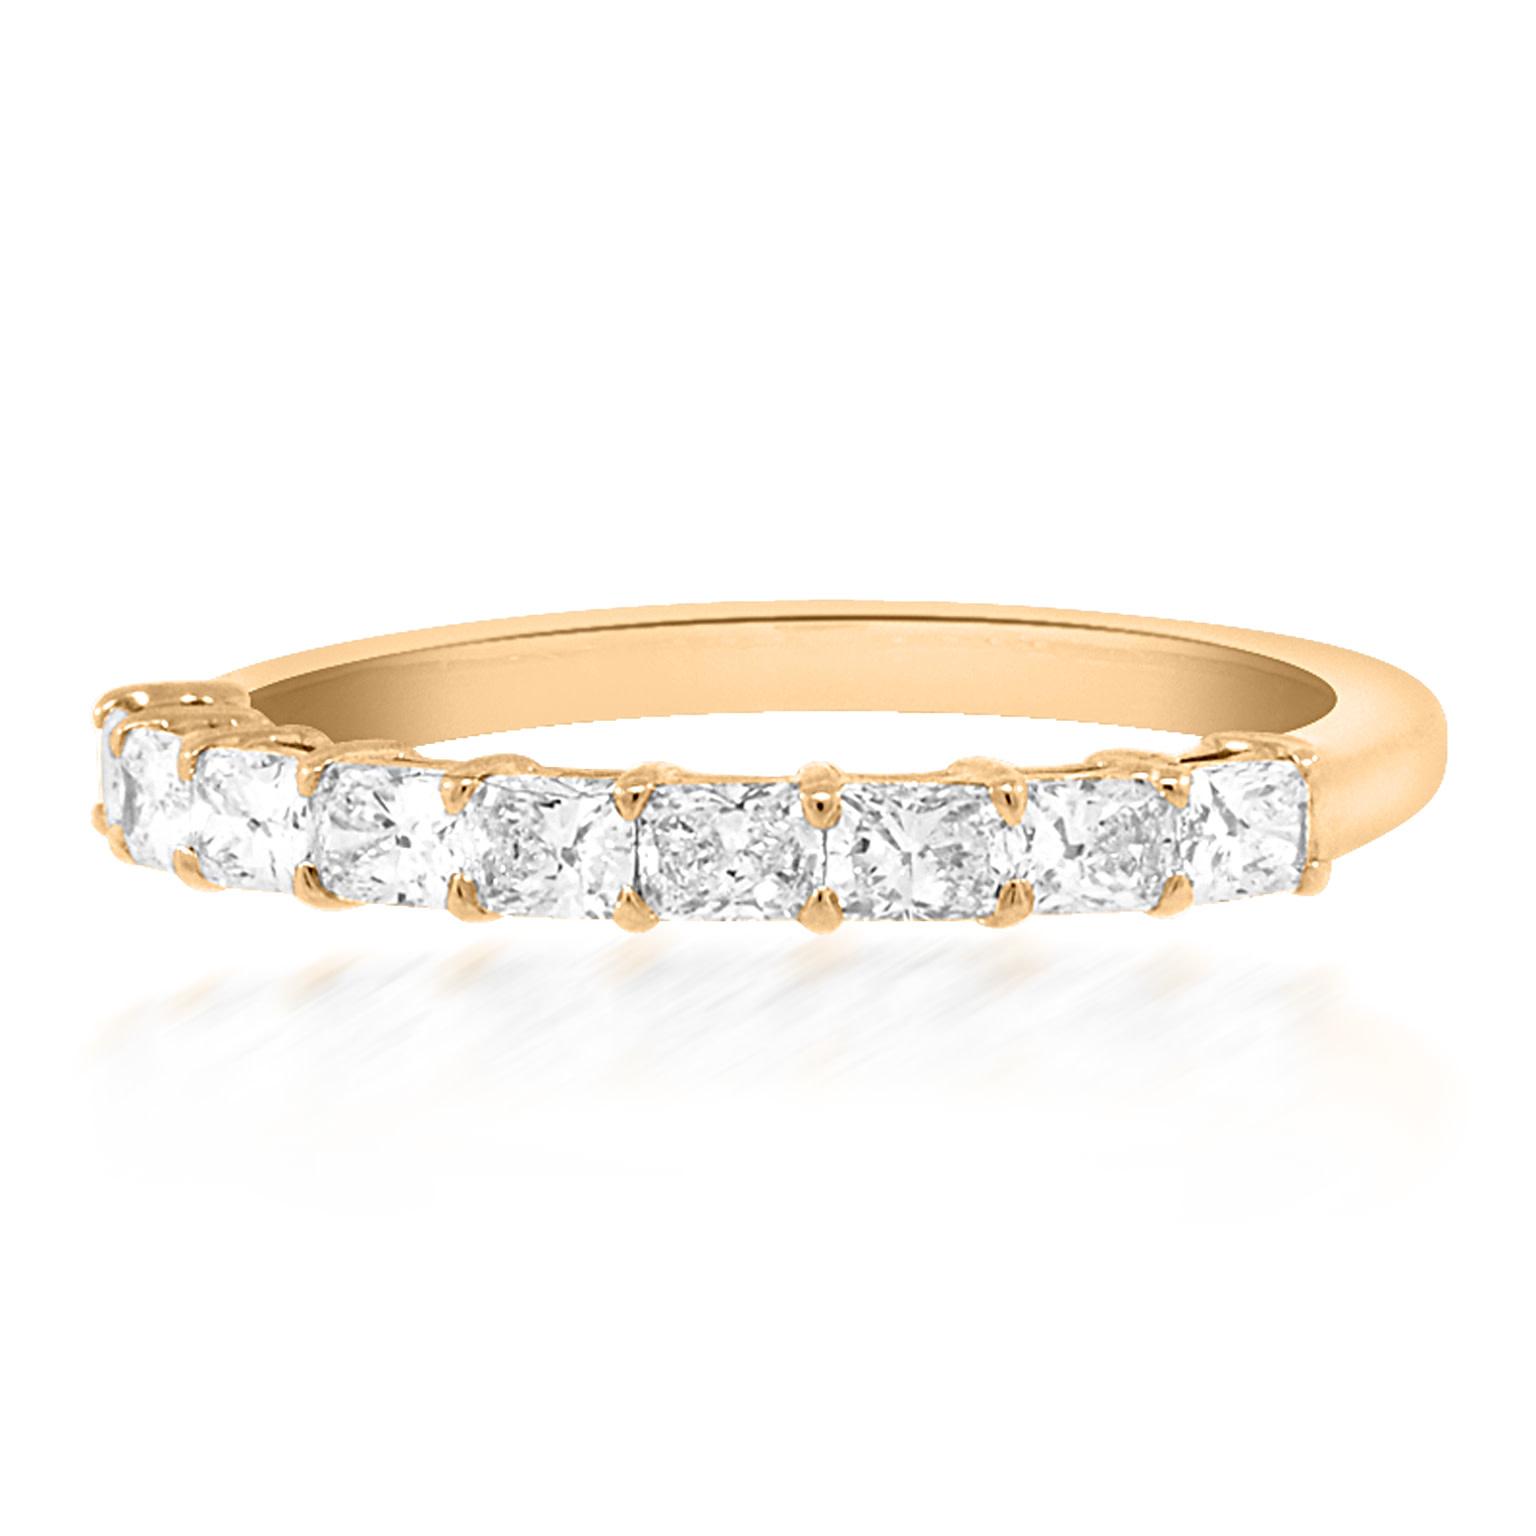 Trabert Goldsmiths Cushion Cut Diamond Rose Gold Ring